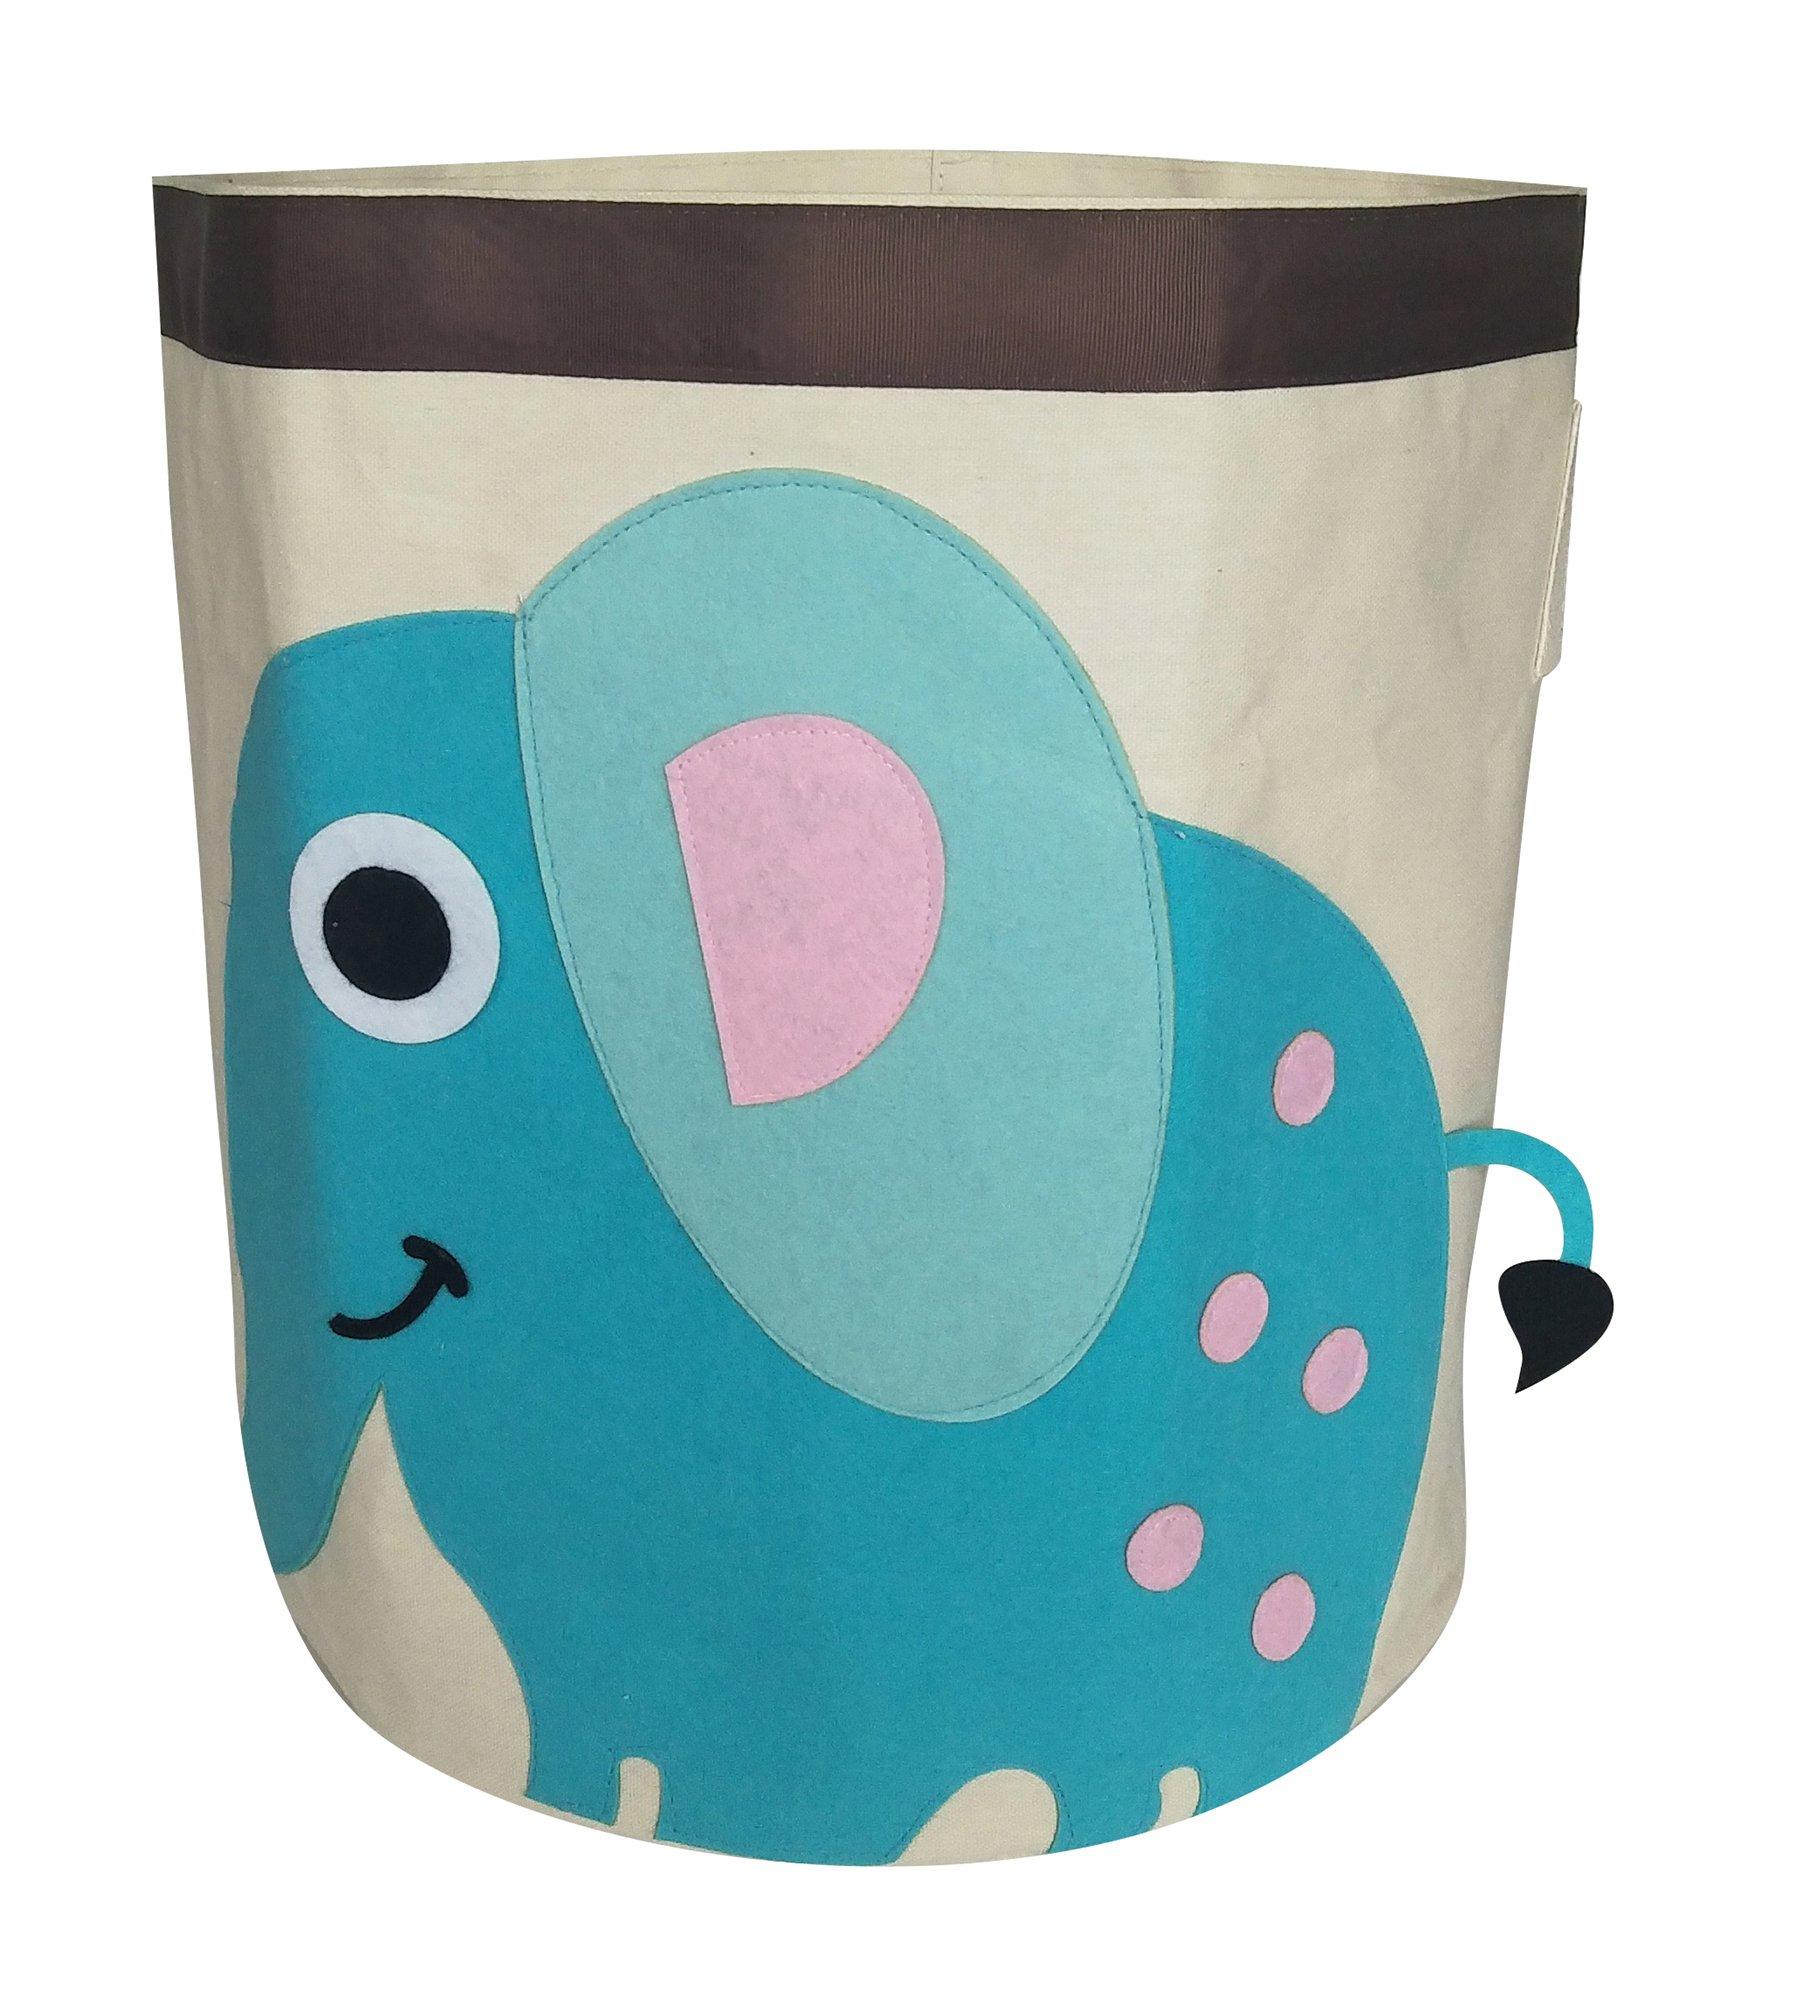 Get Quotations · Large Storage Bin,Cartoon Theme Storage Basket  Cute Toy  Organizer  Collapsible Laundry Hamper